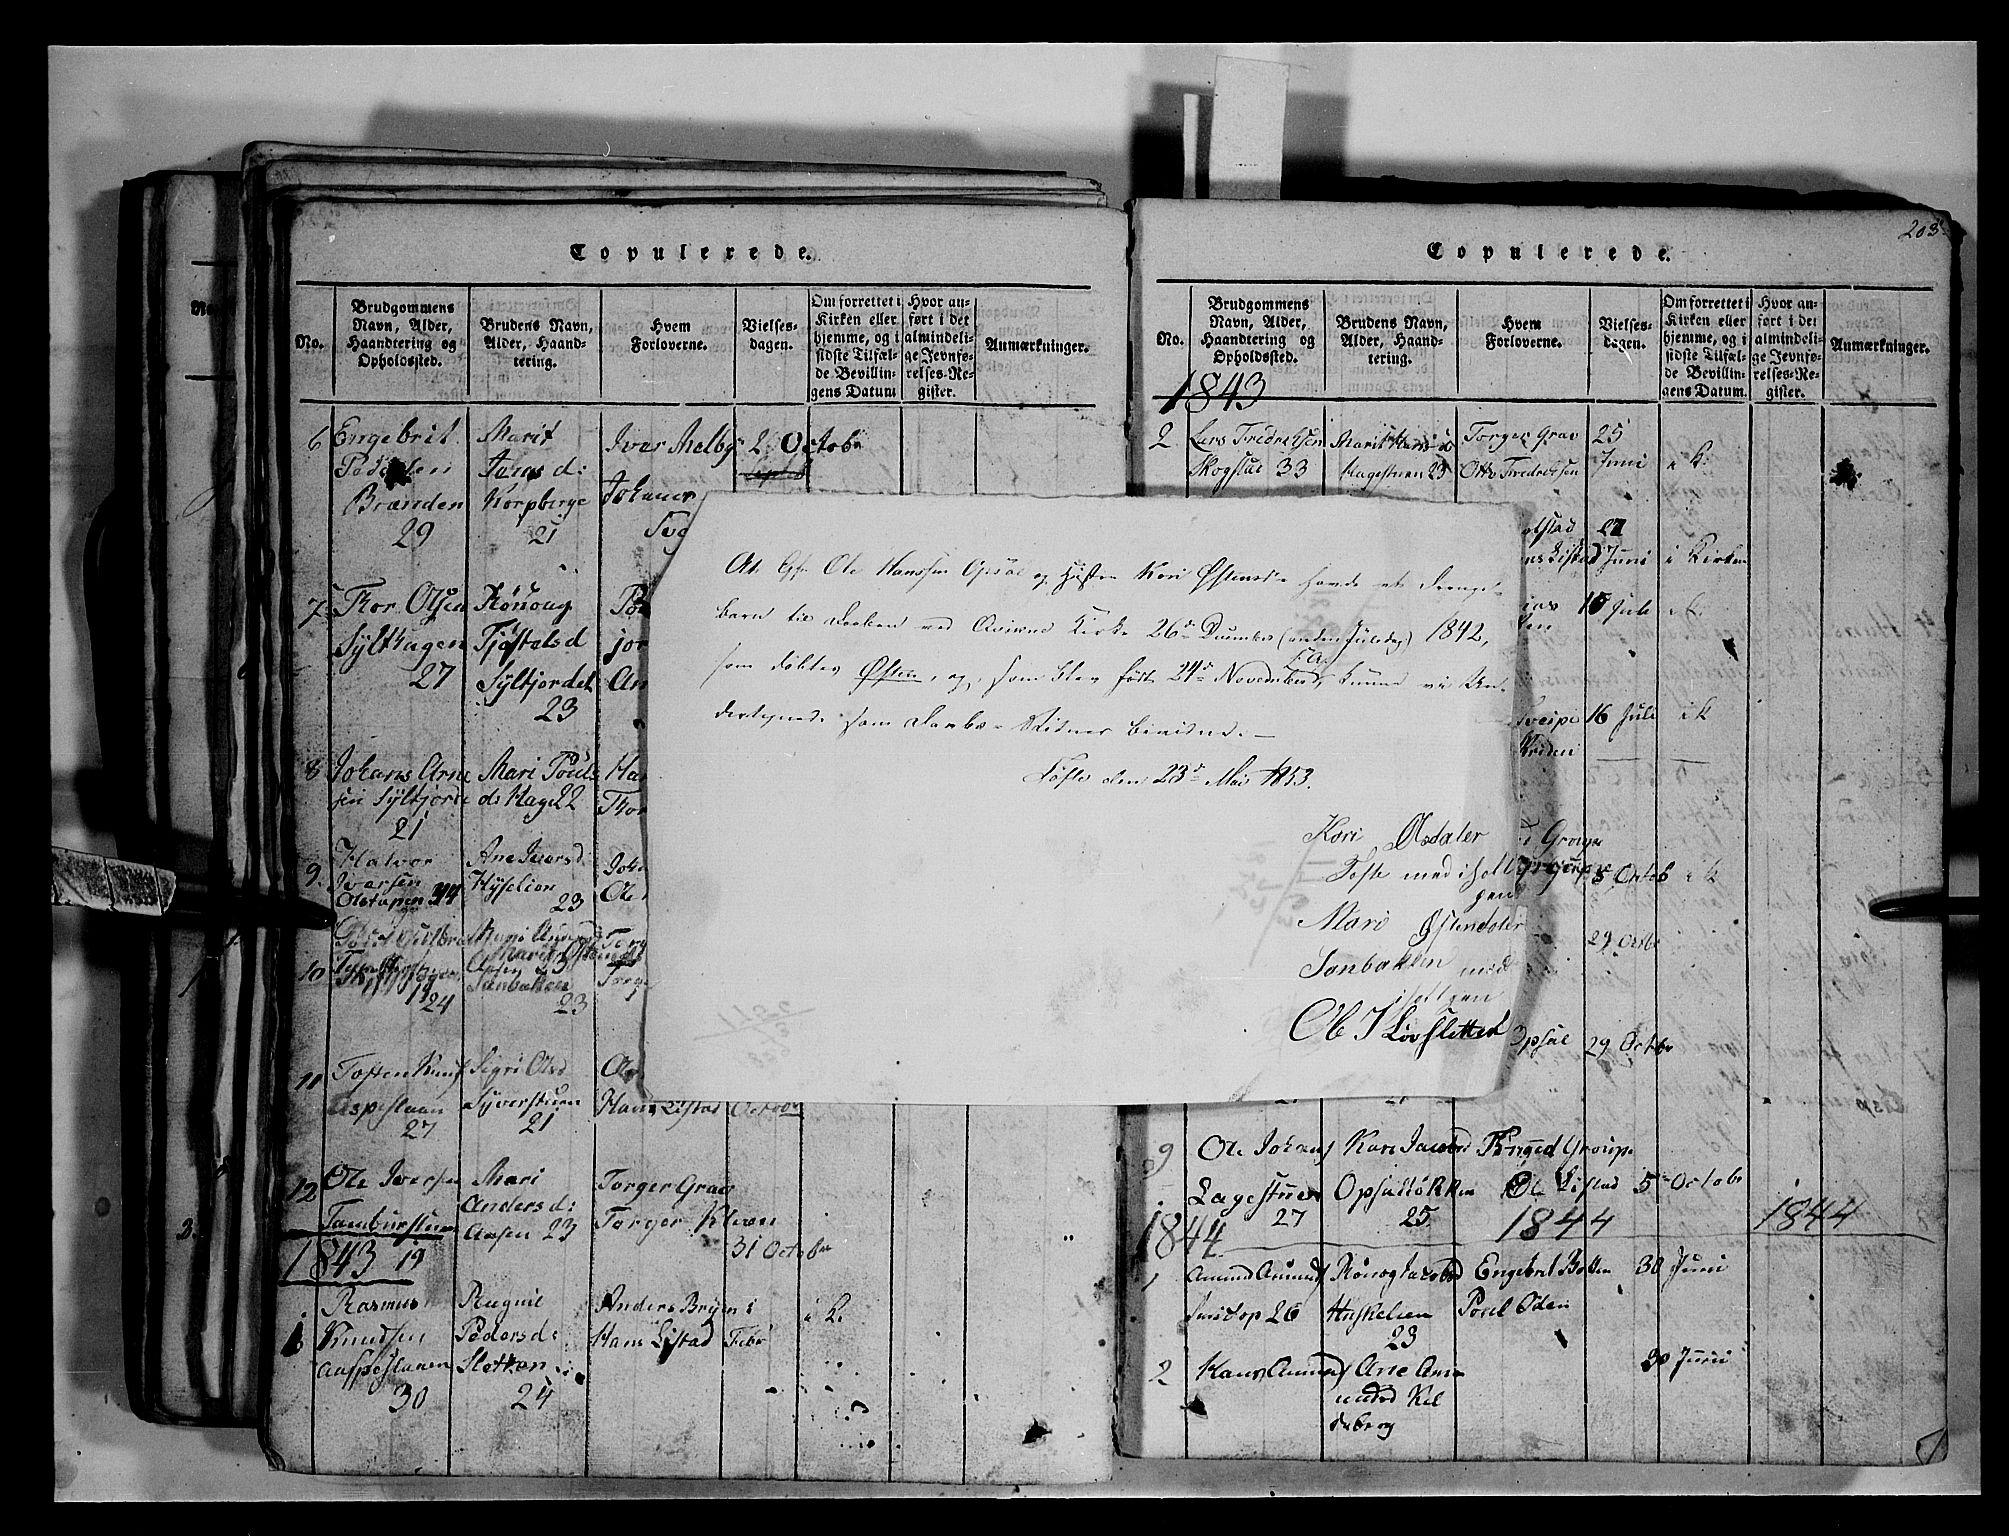 SAH, Fron prestekontor, H/Ha/Hab/L0003: Klokkerbok nr. 3, 1816-1850, s. 203